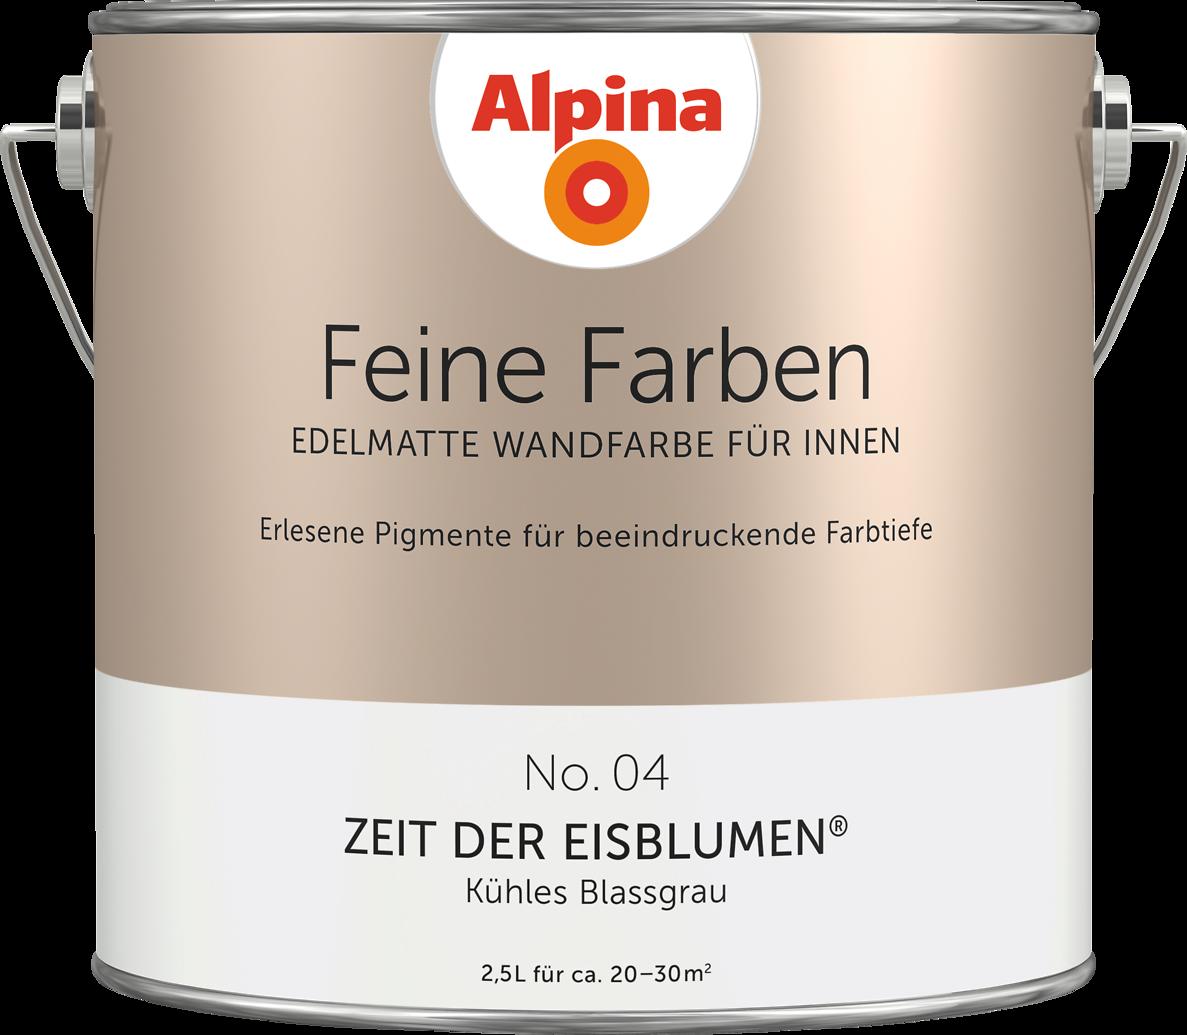 premium wandfarbe grau blassgrau alpina feine farben. Black Bedroom Furniture Sets. Home Design Ideas